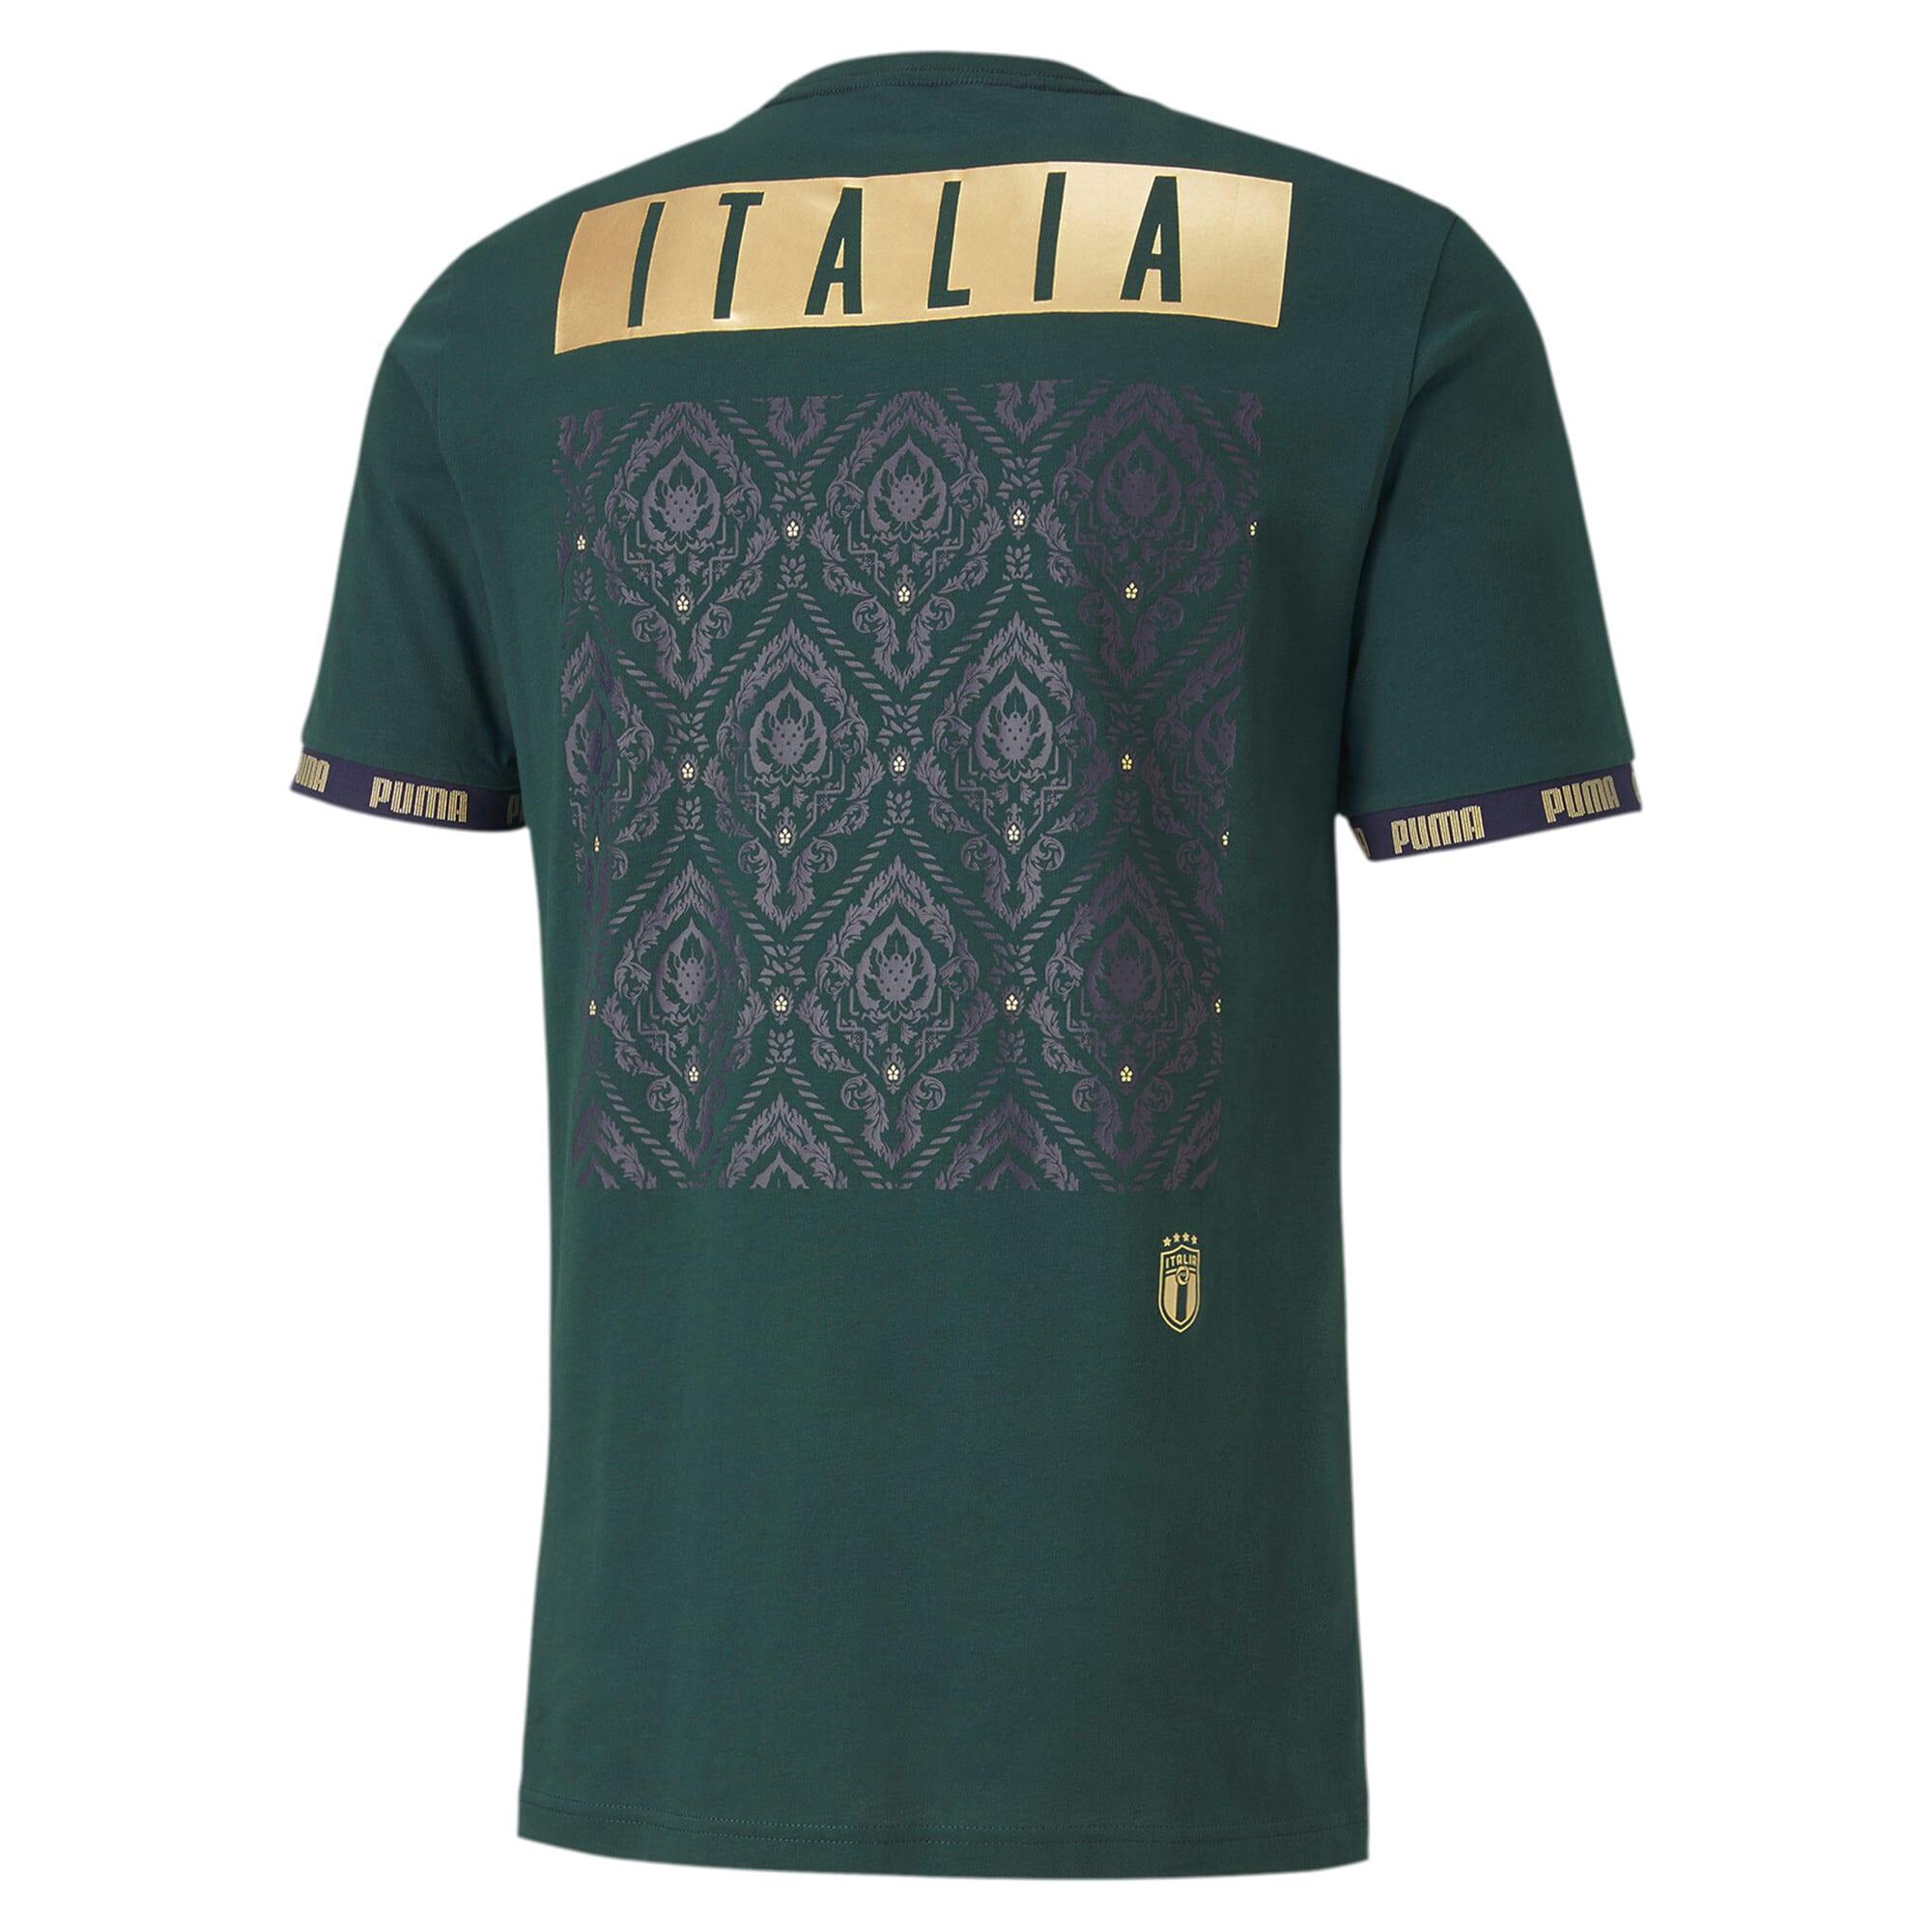 Thumbnail 3 of FIGC イタリア FTBL CULTURE Tシャツ 半袖, Ponderosa Pine, medium-JPN